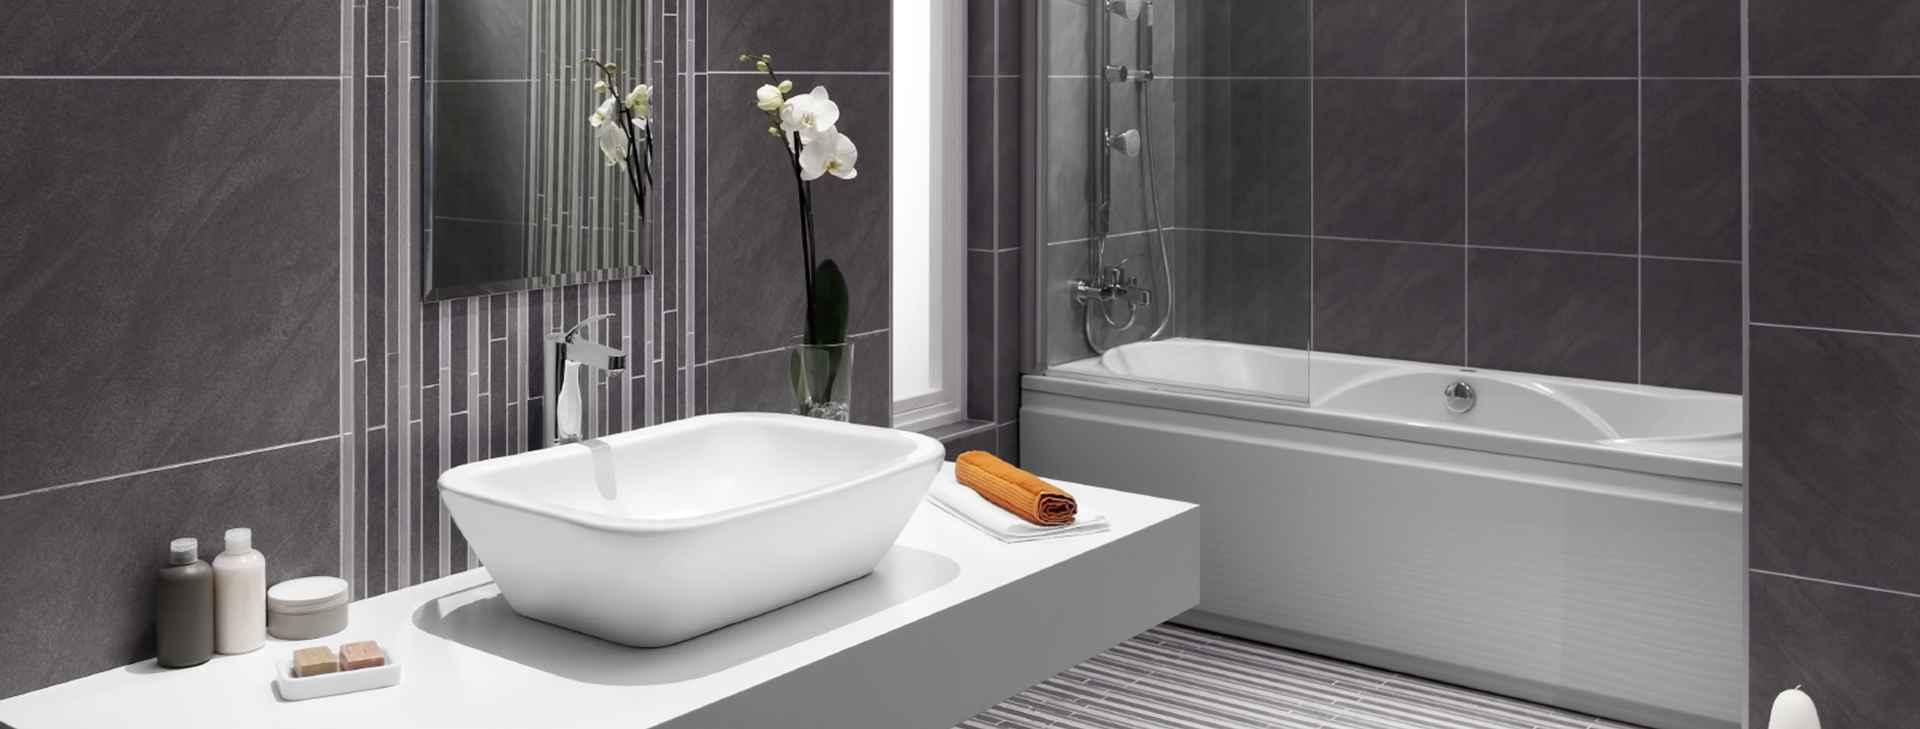 Bathroom iStock_000015146212 - resized